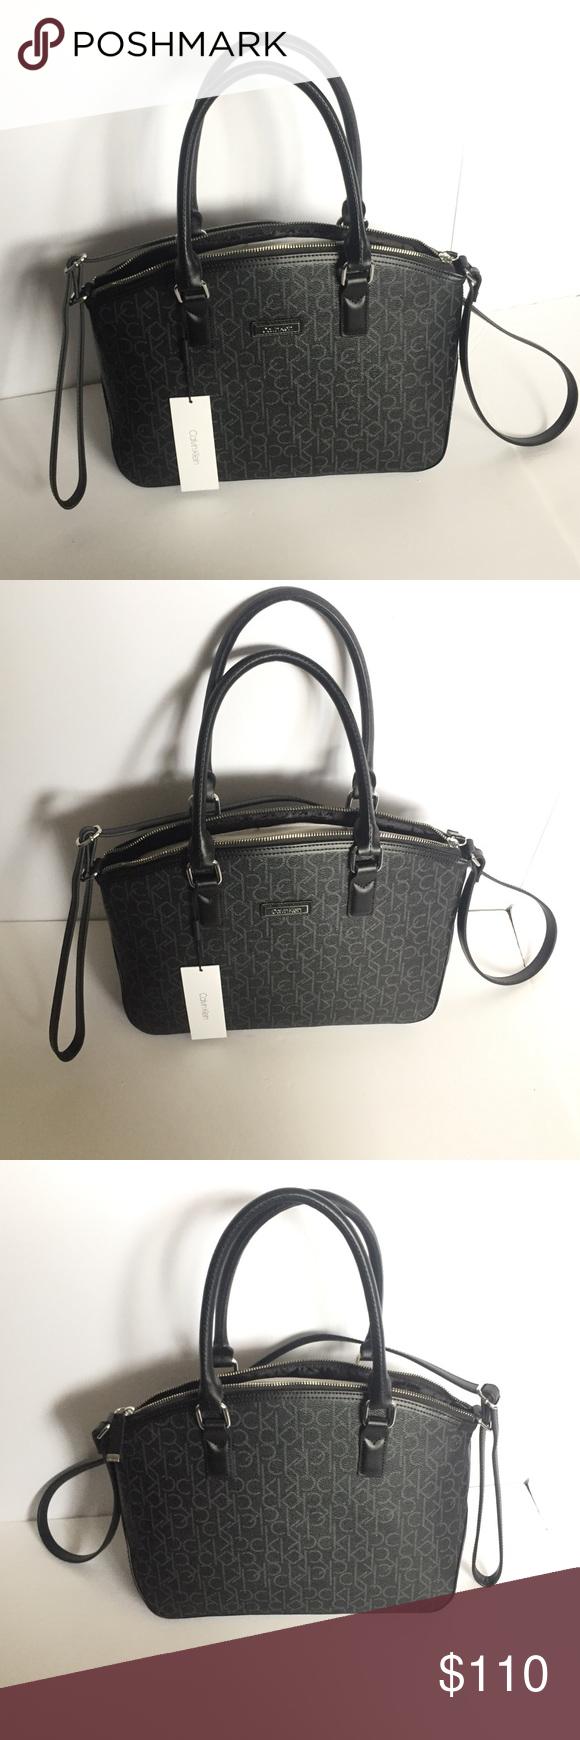 2bf76804c86 Spotted while shopping on Poshmark: NWT Calvin Klein CK Signature Handbag  Purse Black! #poshmark #fashion #shopping #style #Calvin Klein #Handbags